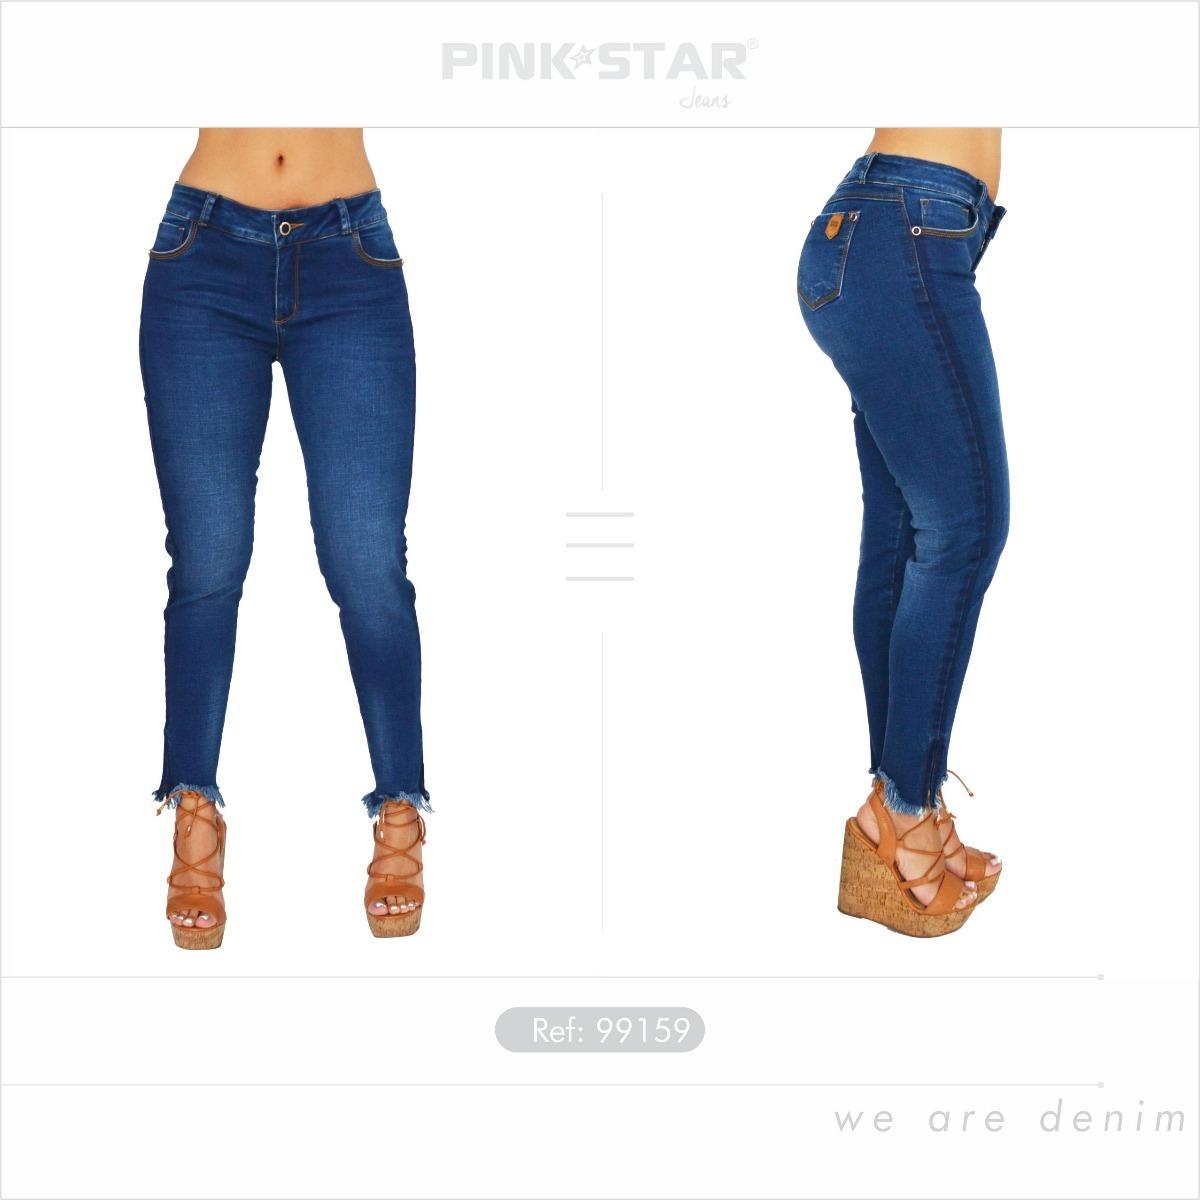 Jeans Dama Levantacola - Pink Star Jeans Push Up -   52.500 en ... 872cdcaf0a32